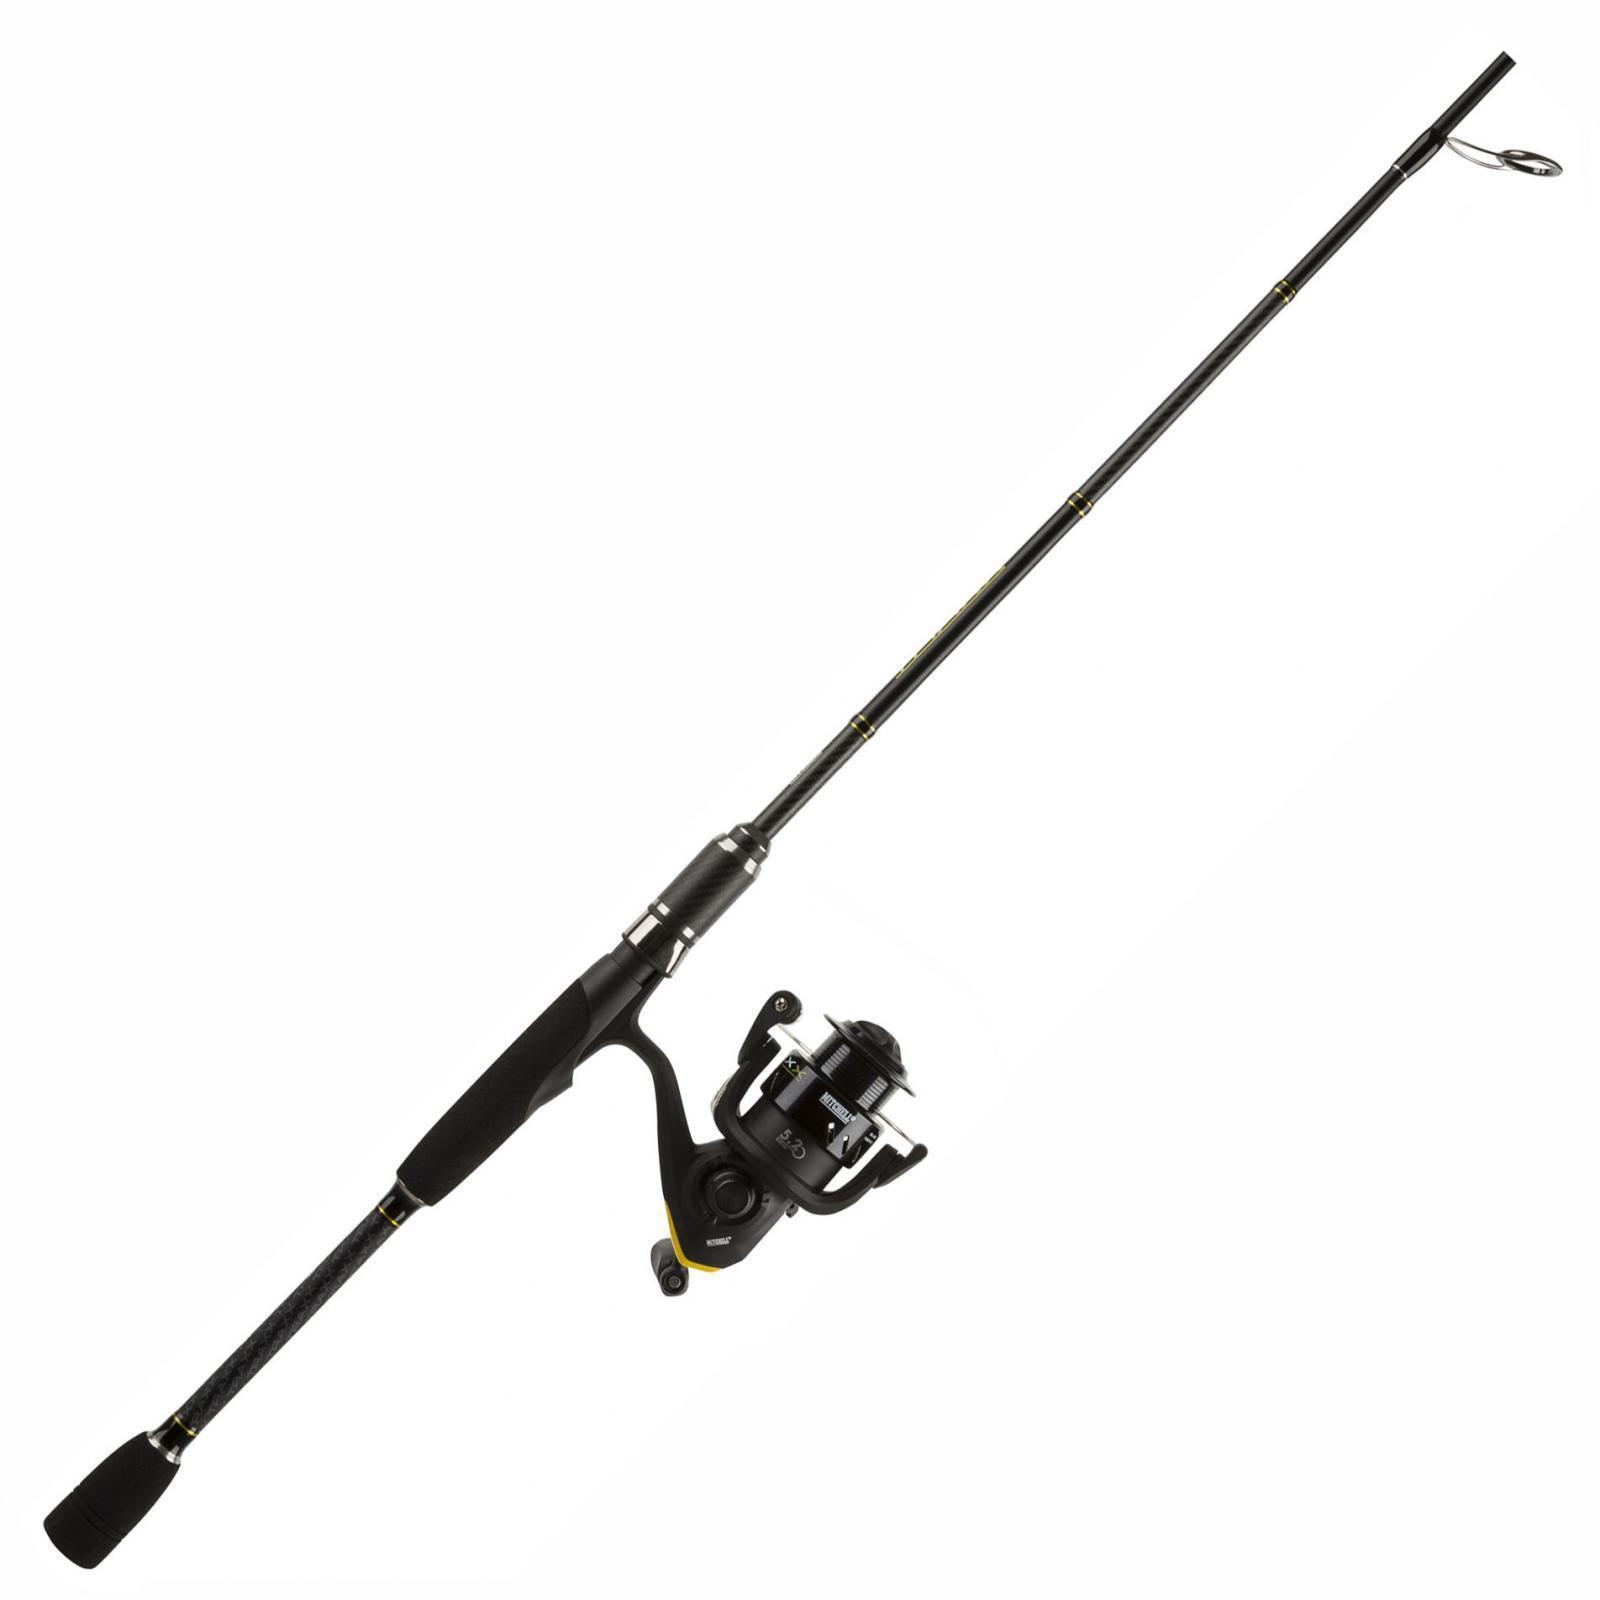 1455416 Combo Mitchell Traxx Pesca Spinning Canna 2,10 m Mulinello 2000 RN